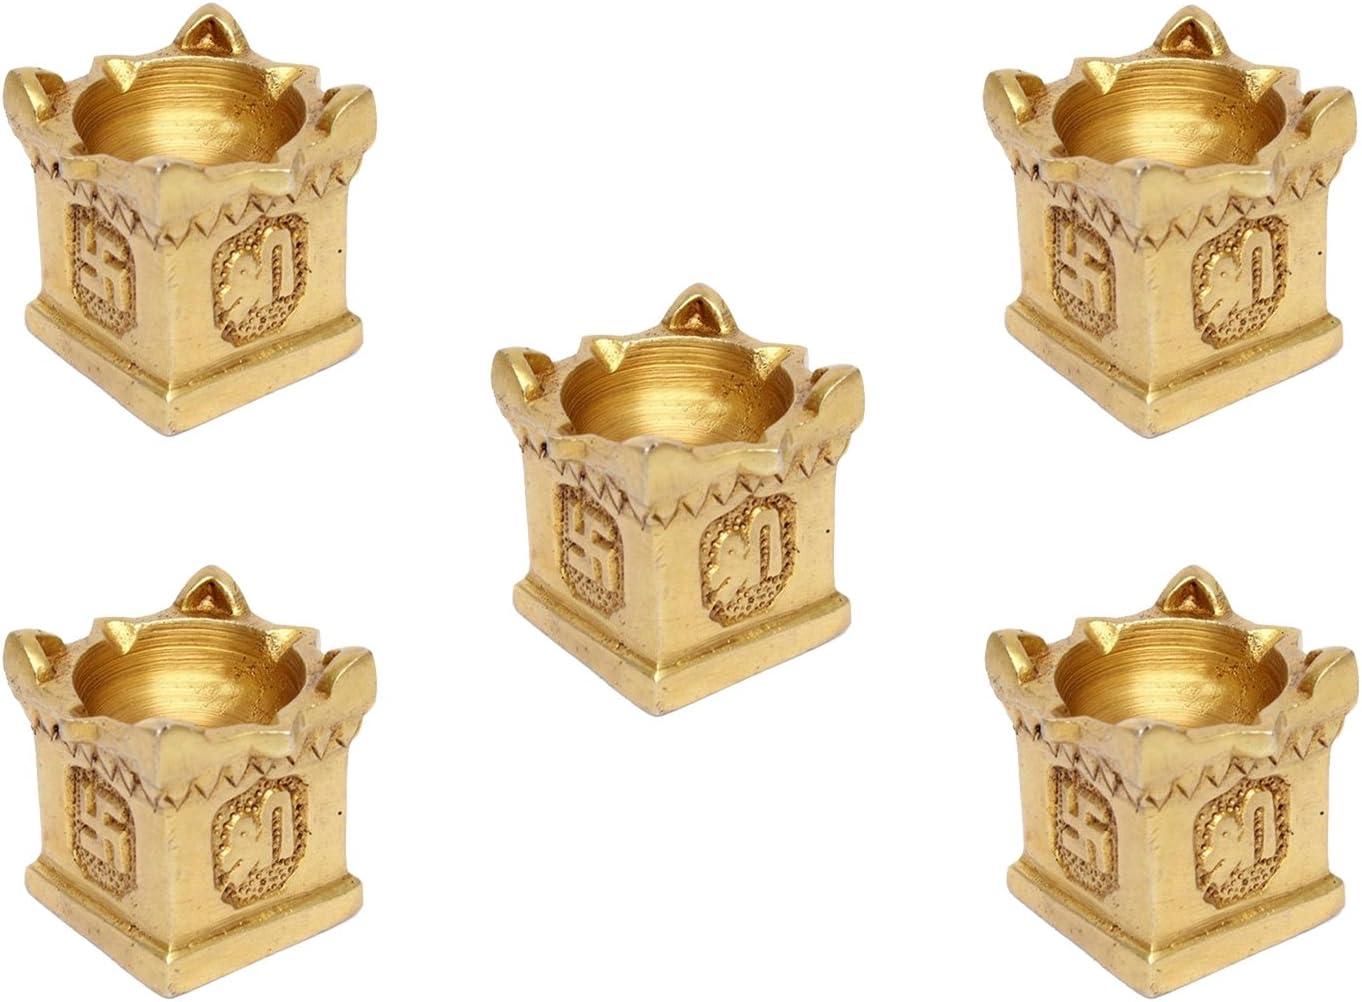 GoldGiftIdeas Brass Tulsi Plant Diya, Diya for Pooja Room, Decorative Diya for Home, Return Gift for Housewarming Pack of 5